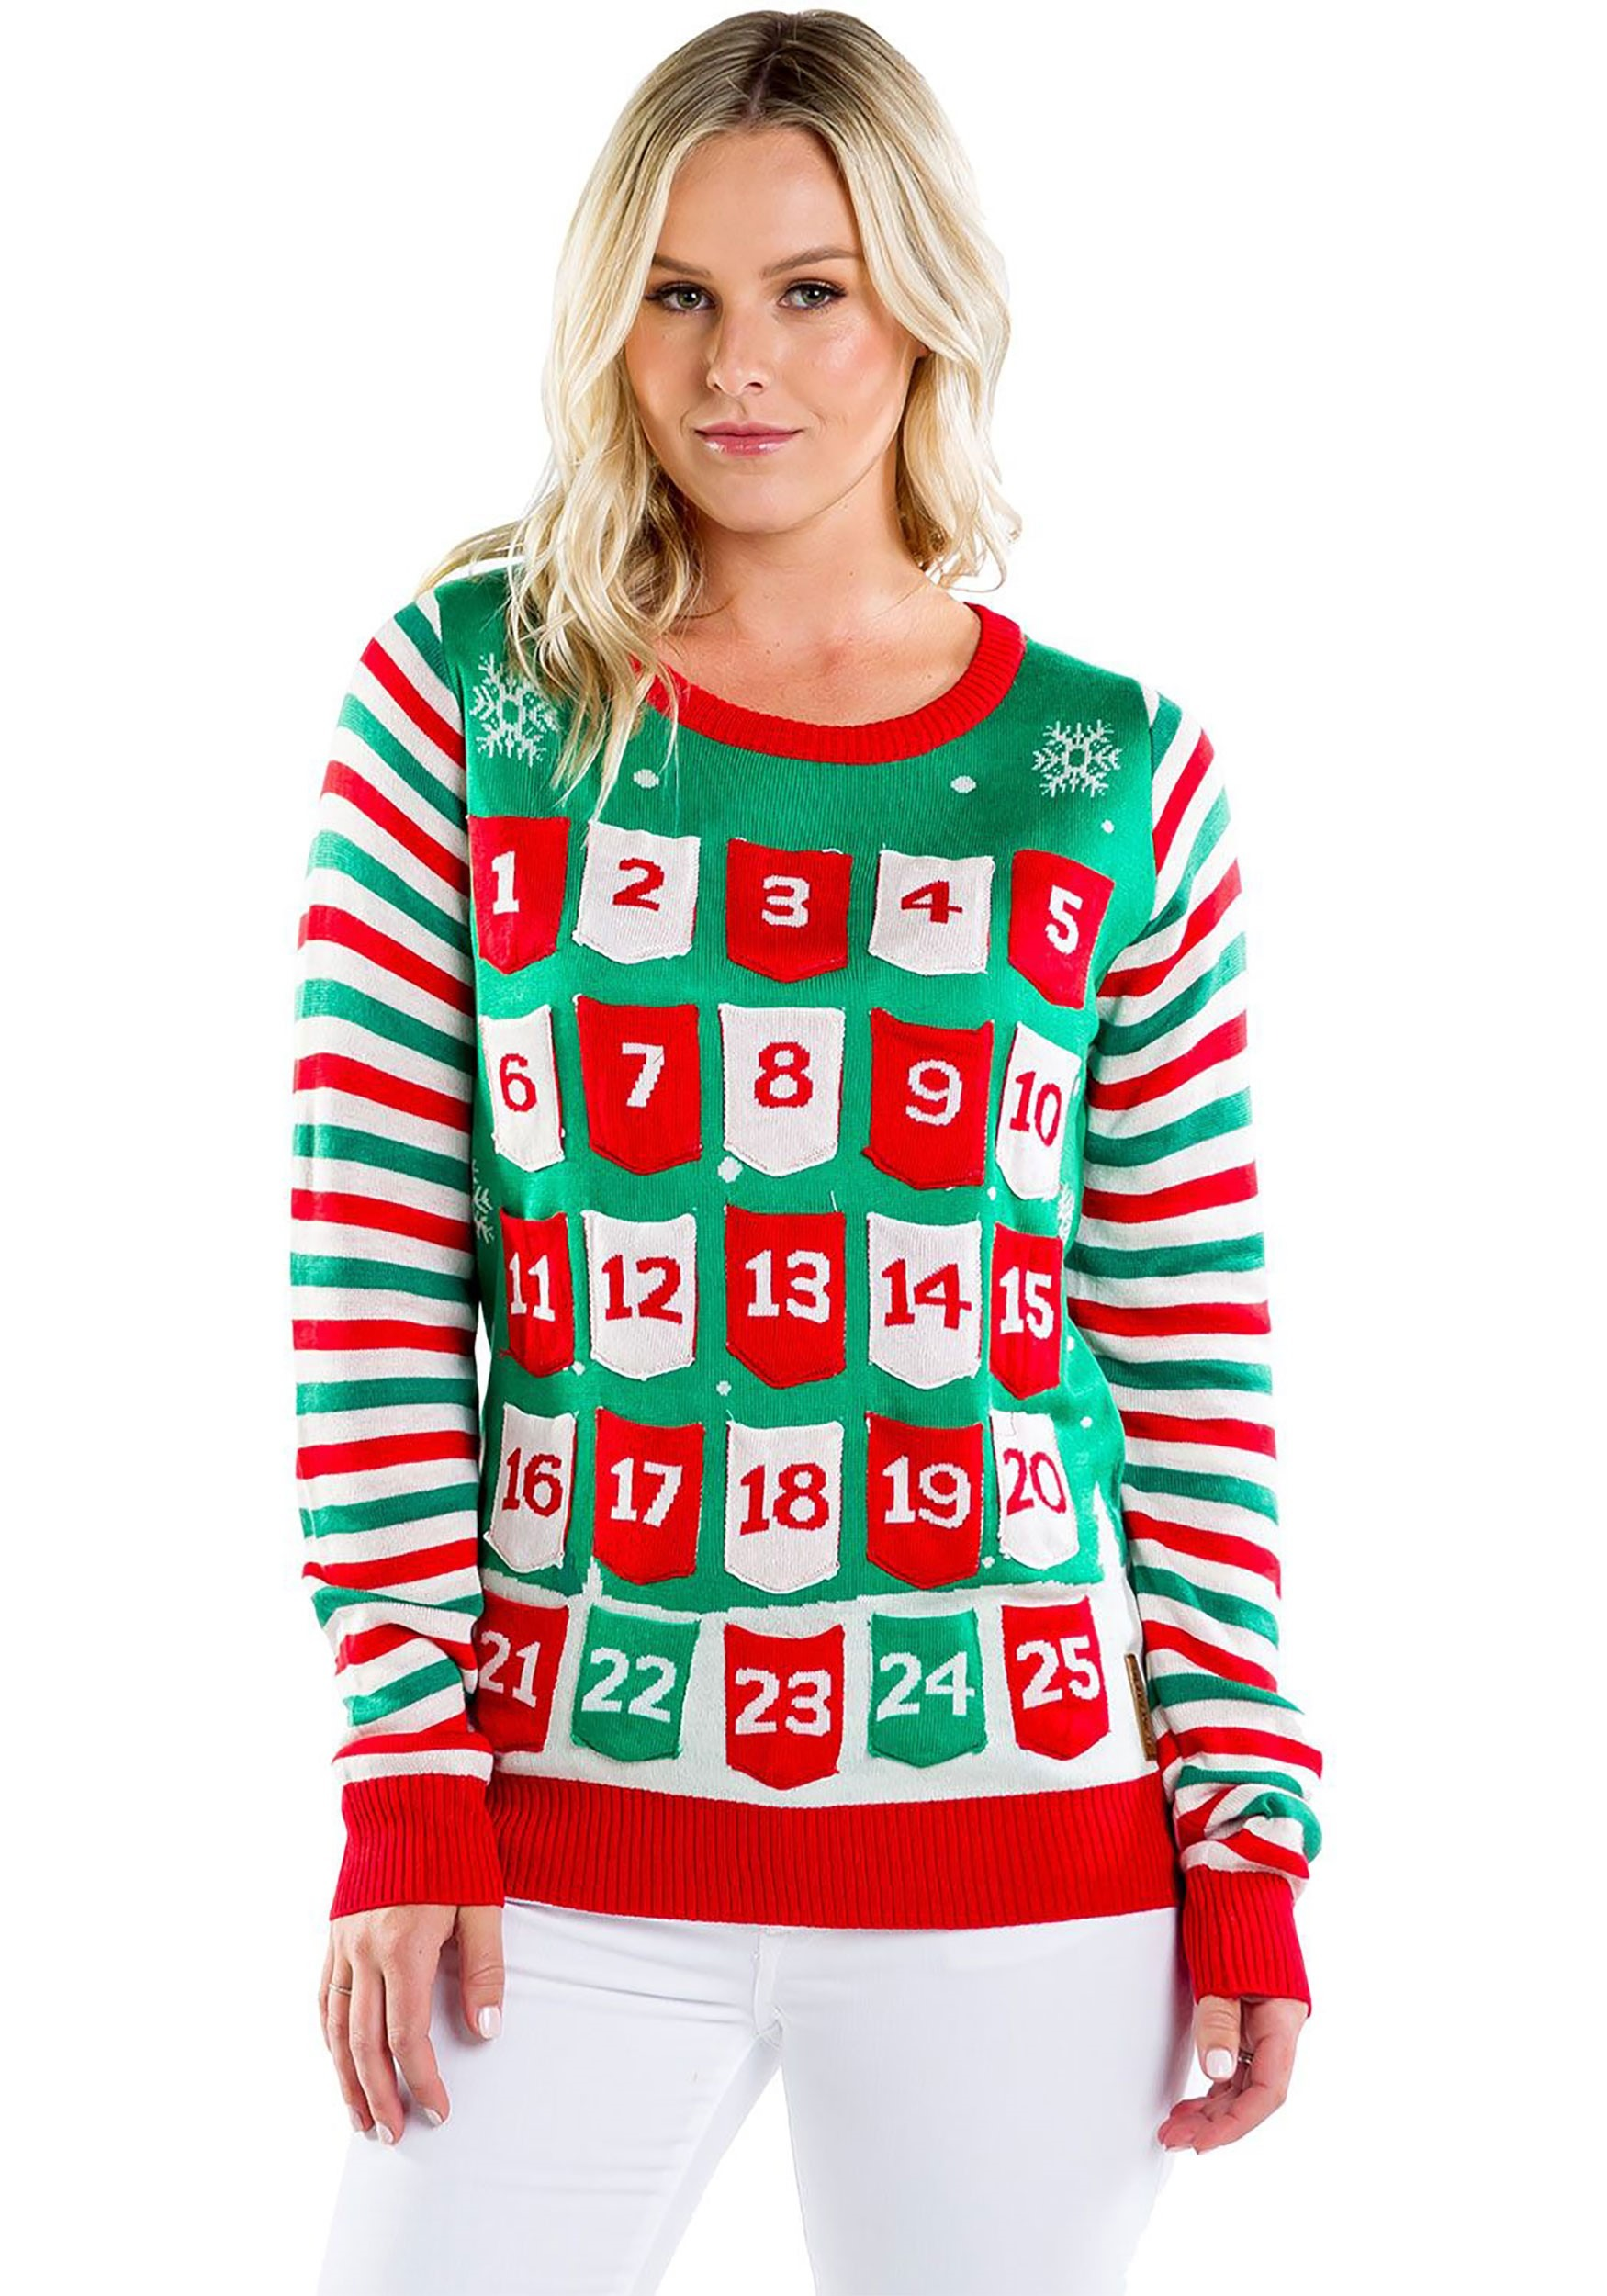 Tipsy Elves Advent Calendar Ugly Christmas Sweater for Women